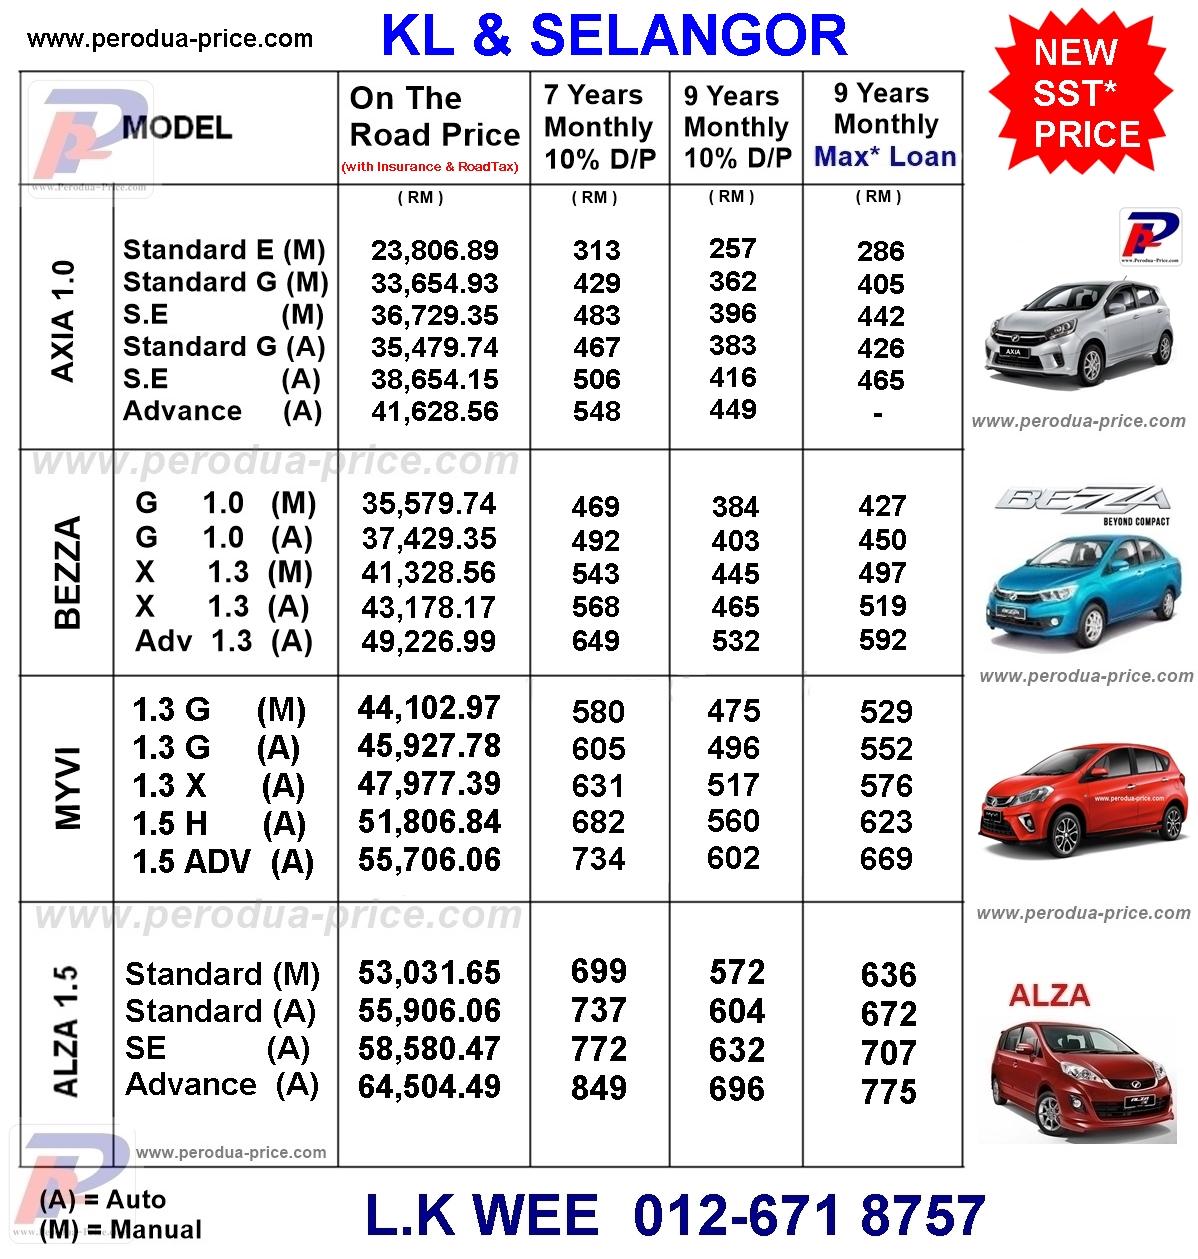 Perodua Promotion - Call 012-671 8757